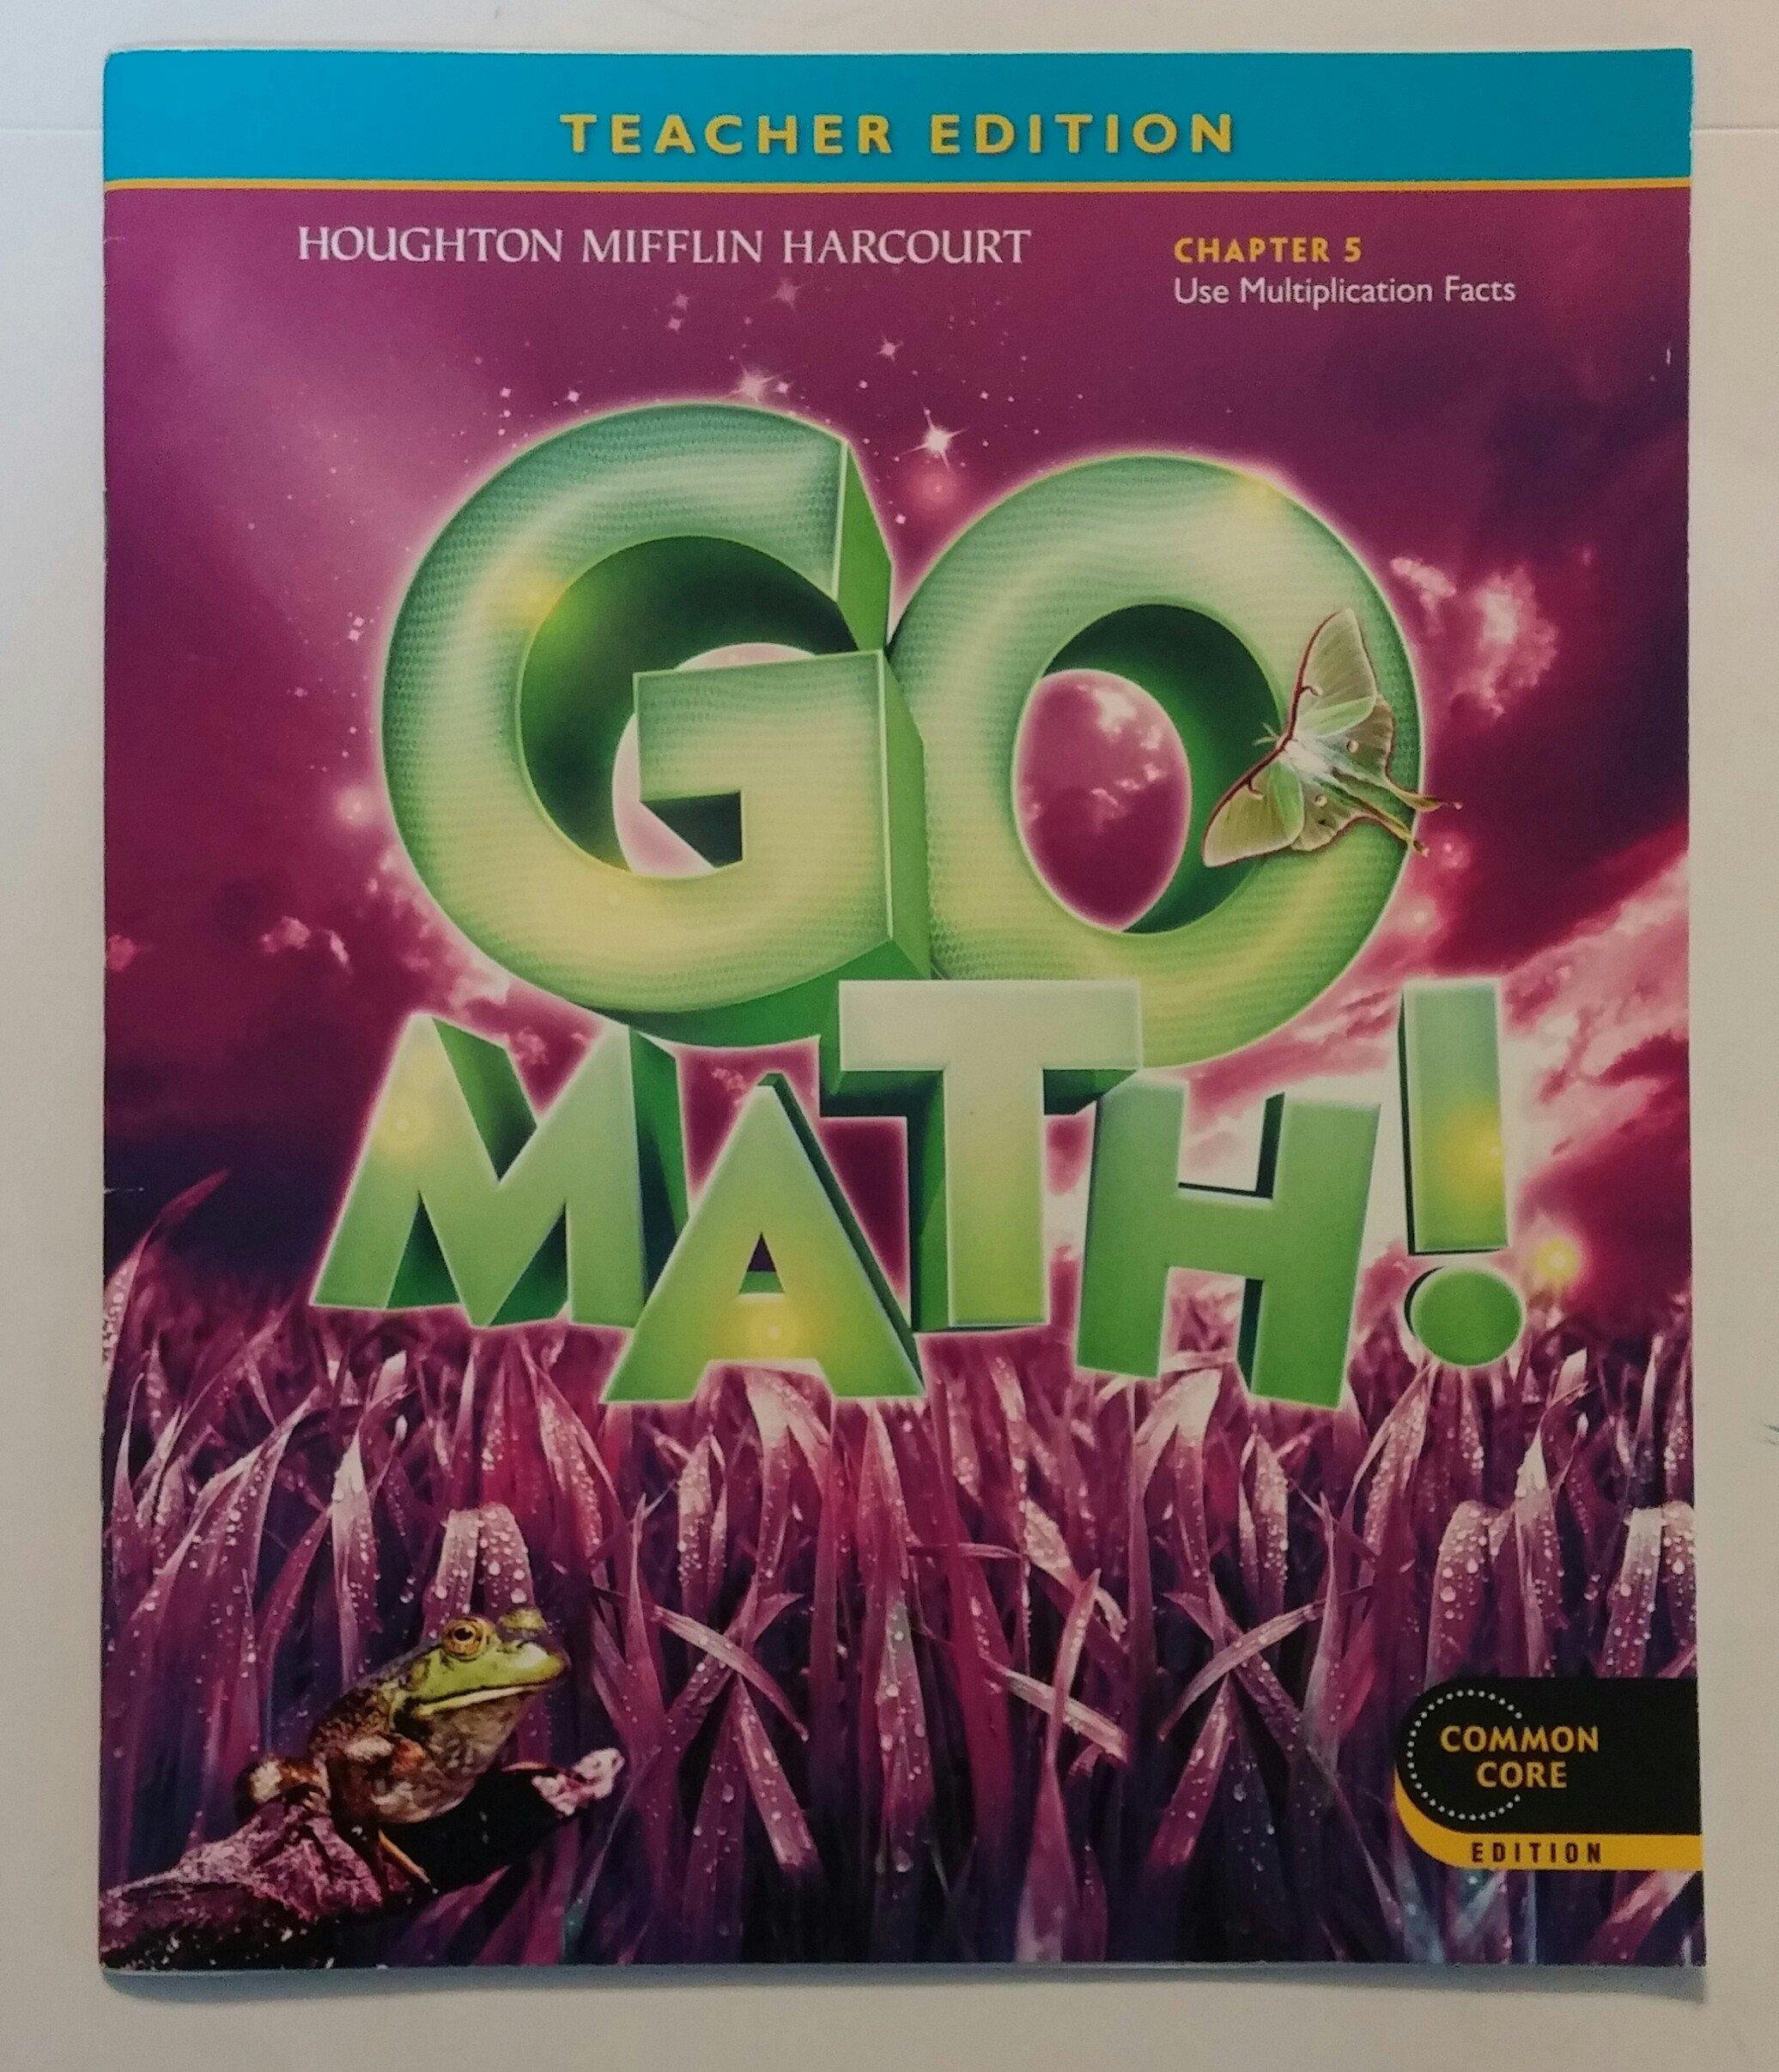 Download Teacher Edition, Go Math!, 3rd Grade, Chapter 5, Use Multiplication Facts ebook